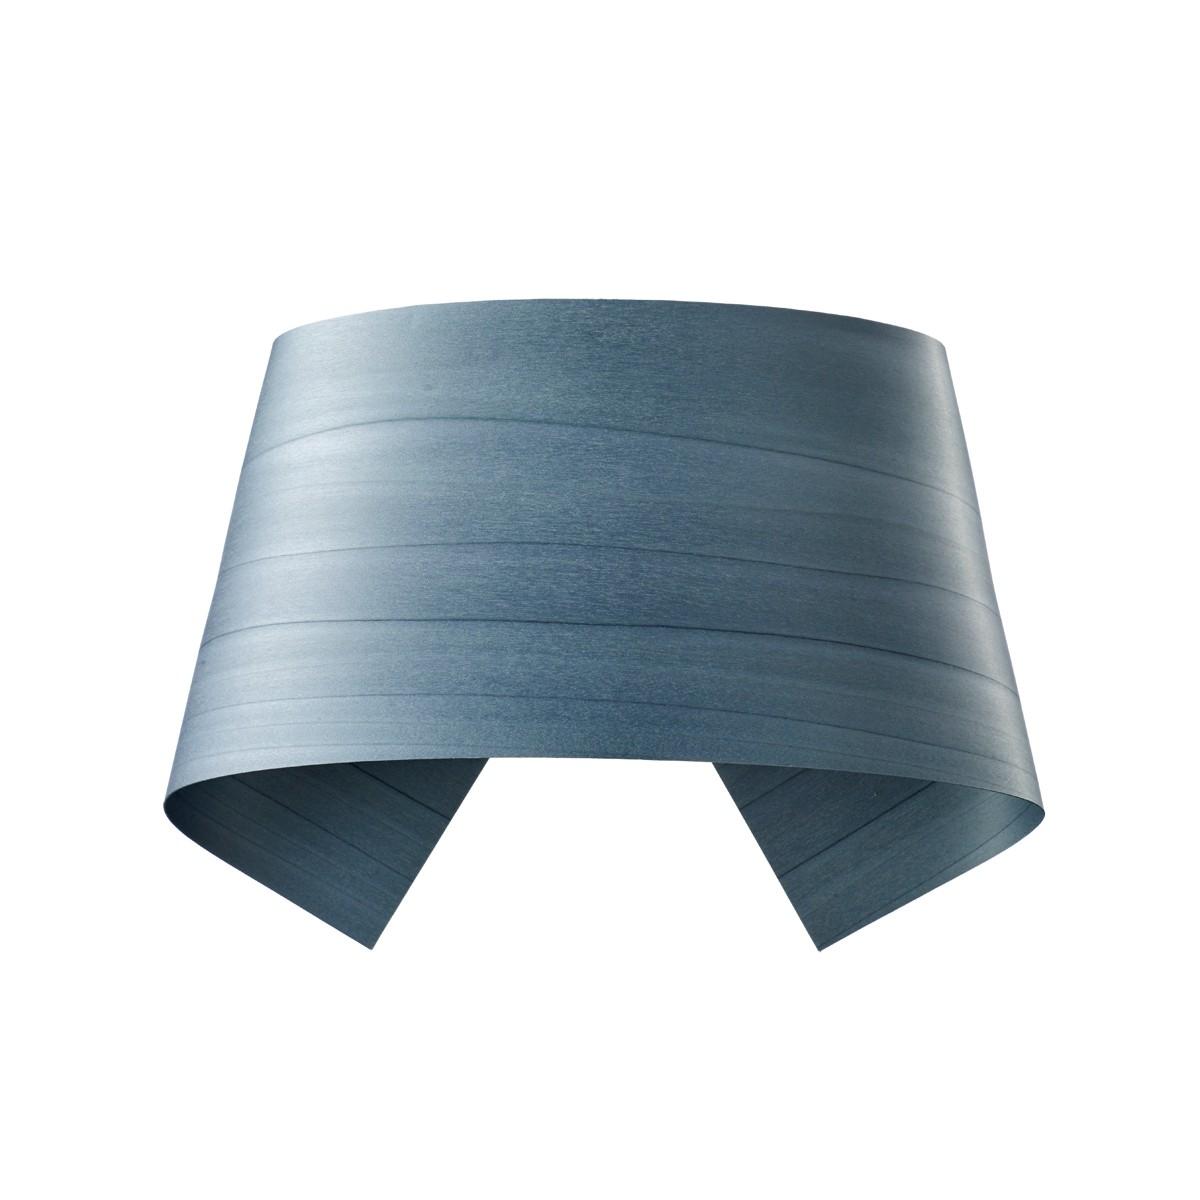 LZF Lamps Hi-Collar Wandleuchte, blau